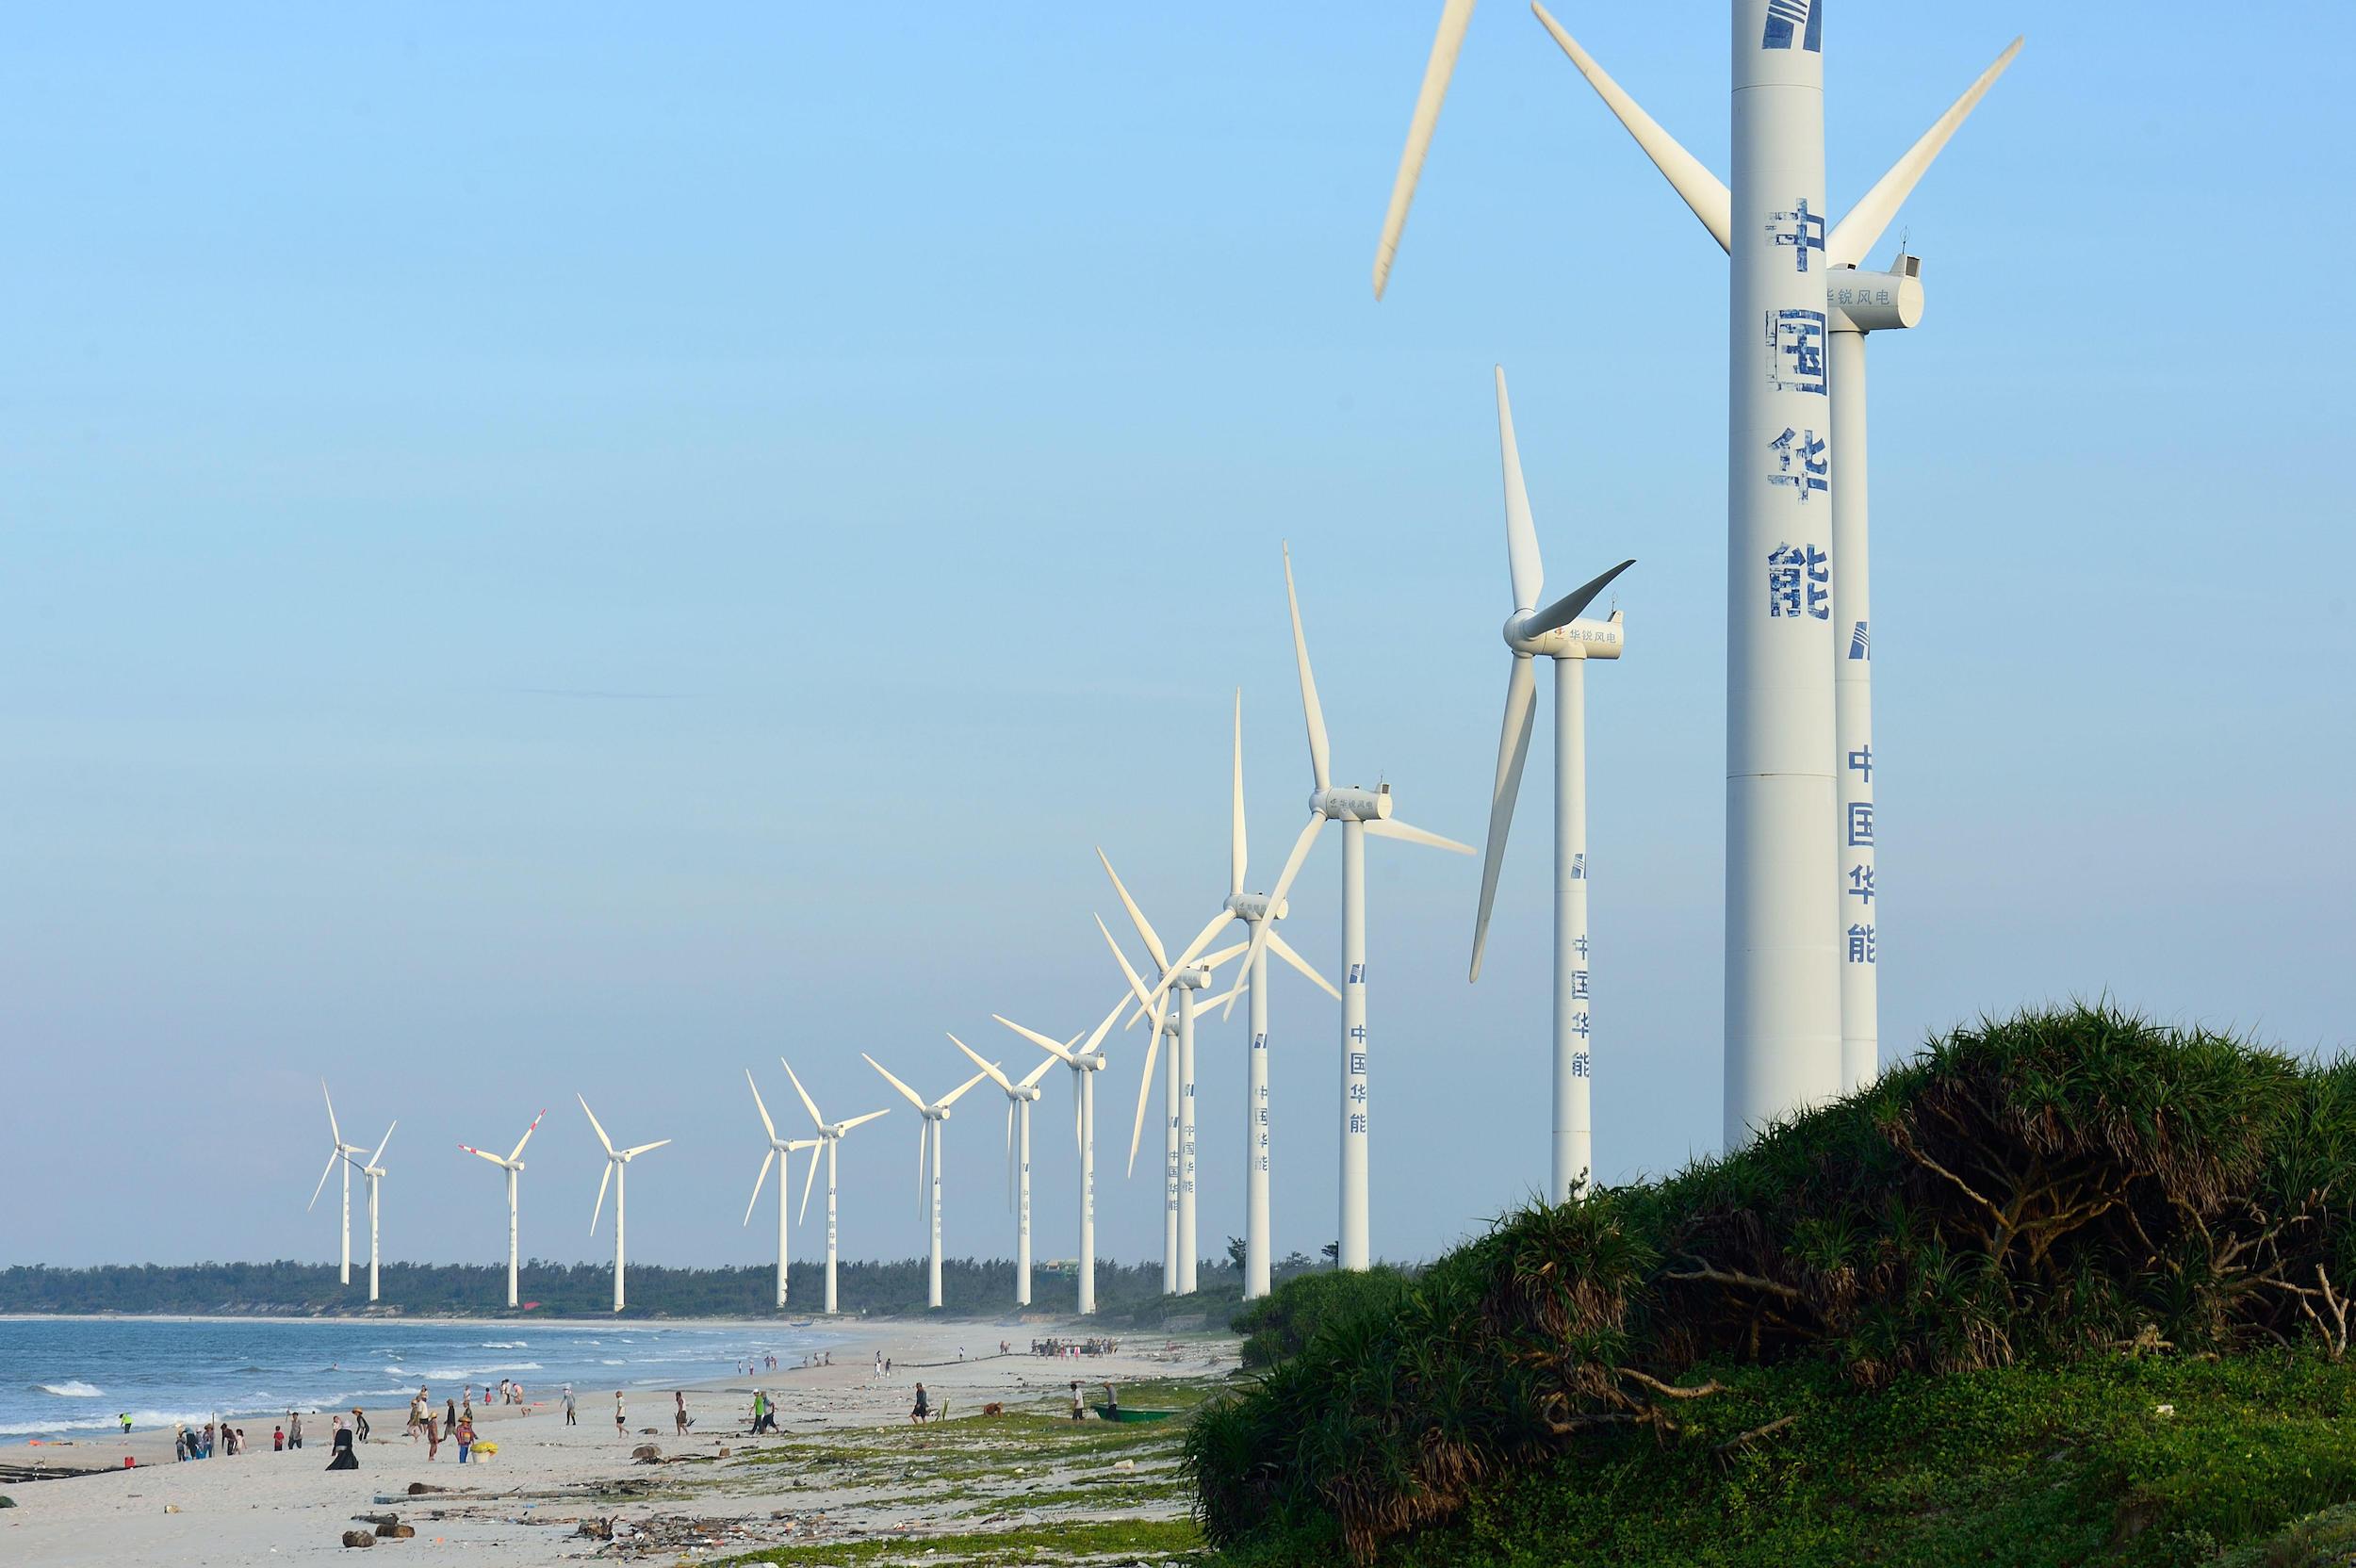 Wind turbines in China's Hainan province (Image: Alamy)